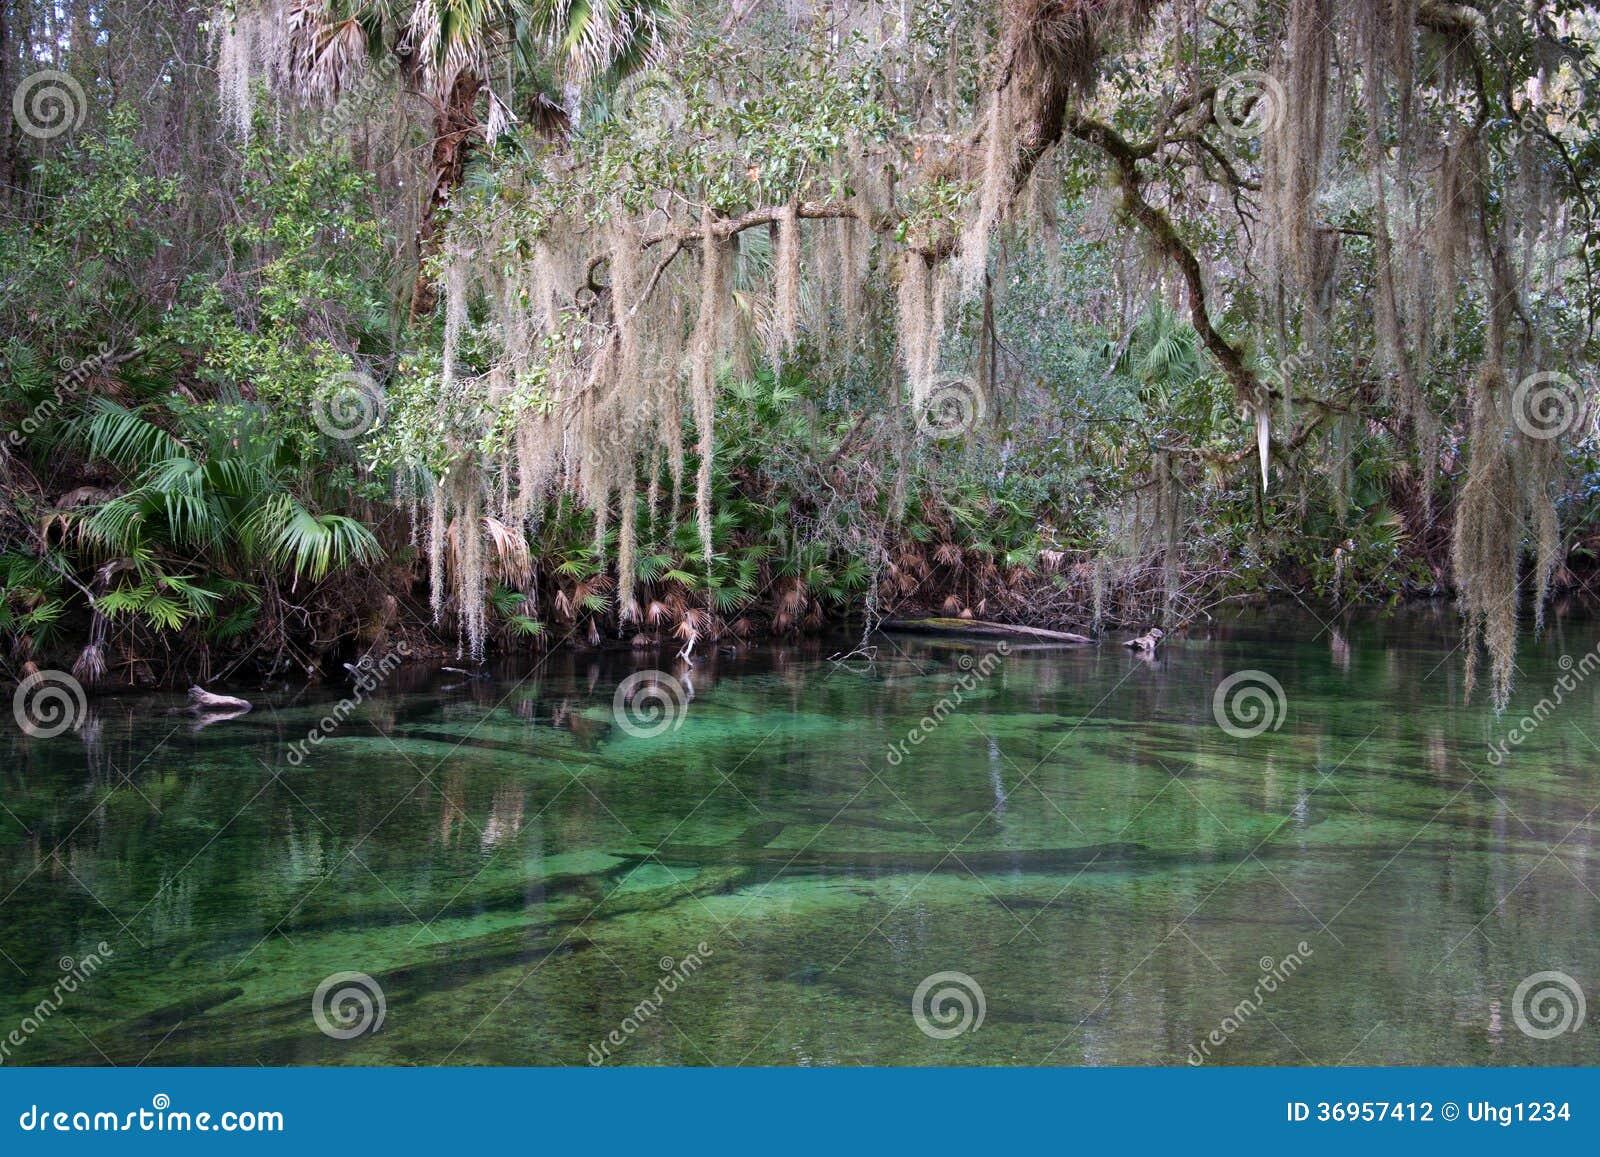 Parque de estado azul de la primavera, la Florida, los E.E.U.U.